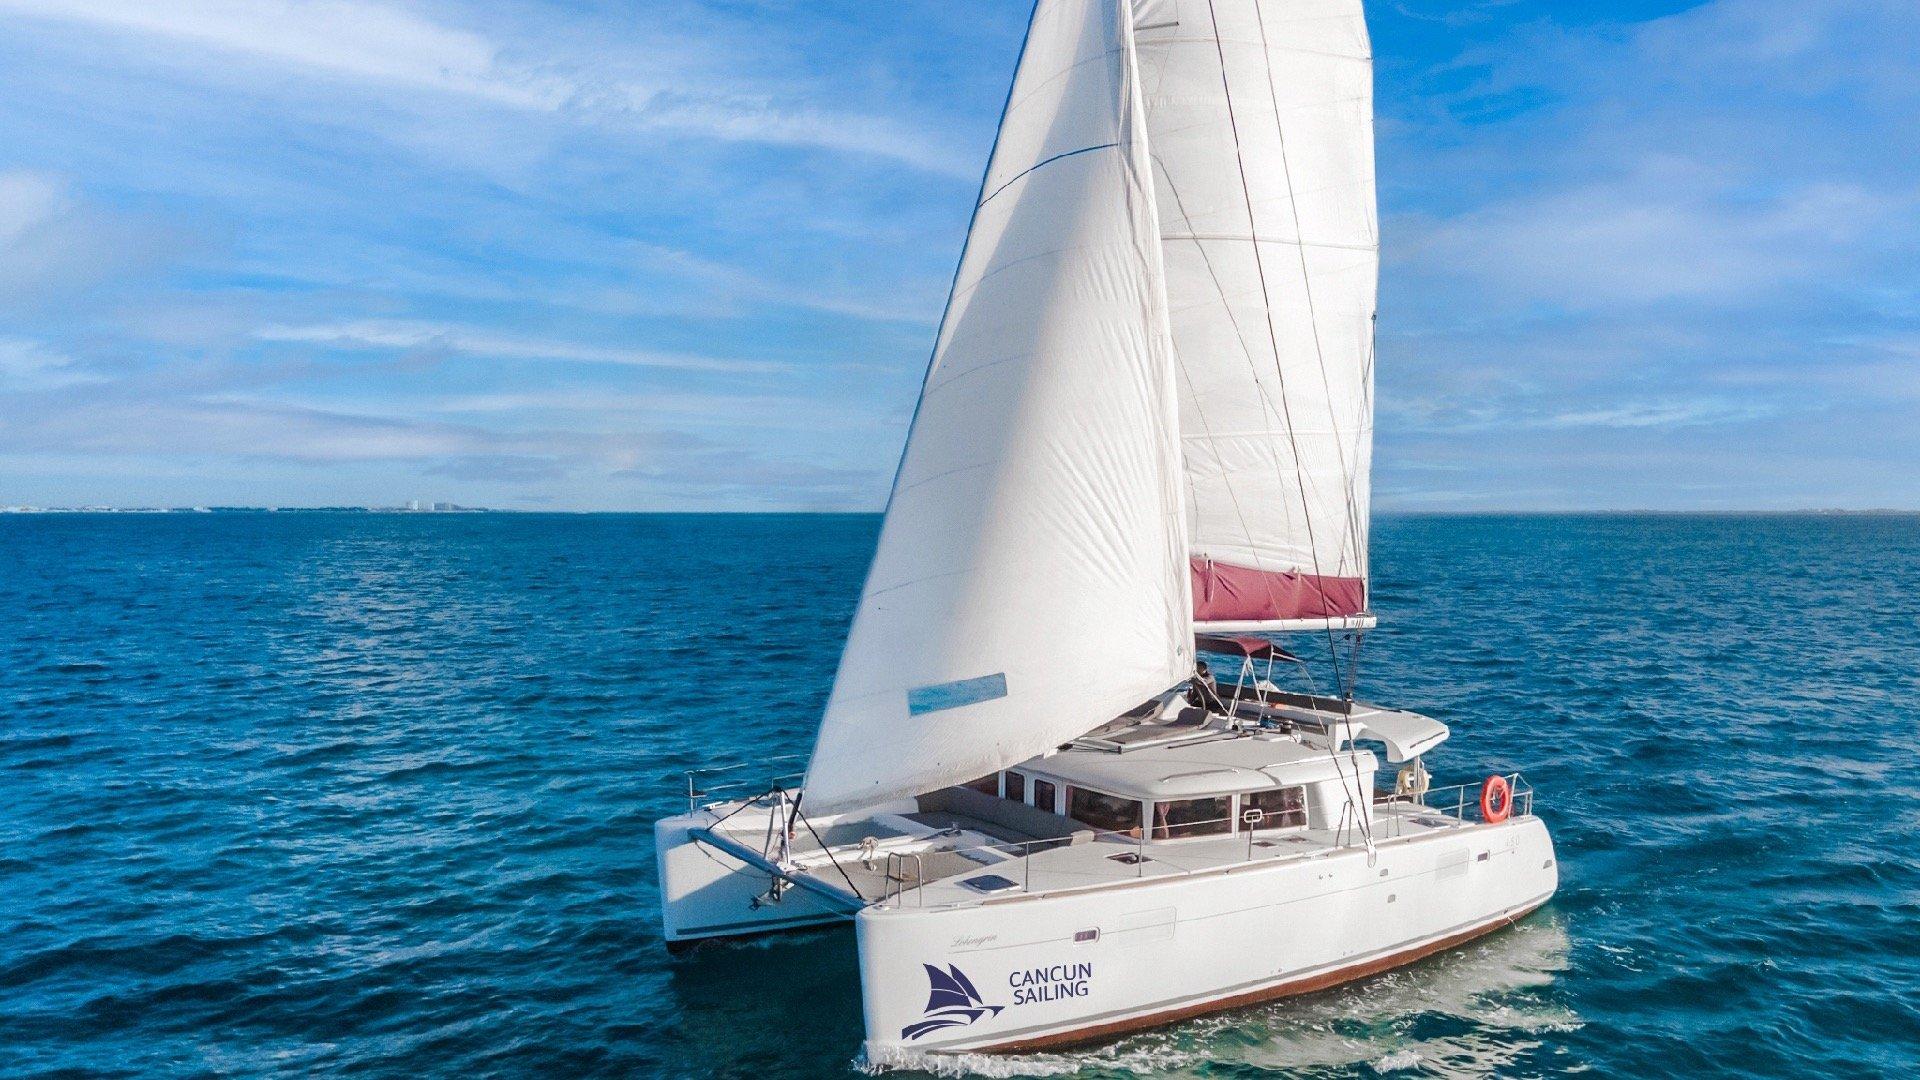 2 - LowRes - Lohengrin - Private tour to Isla Mujeres in catamaran - Cancun Sailing